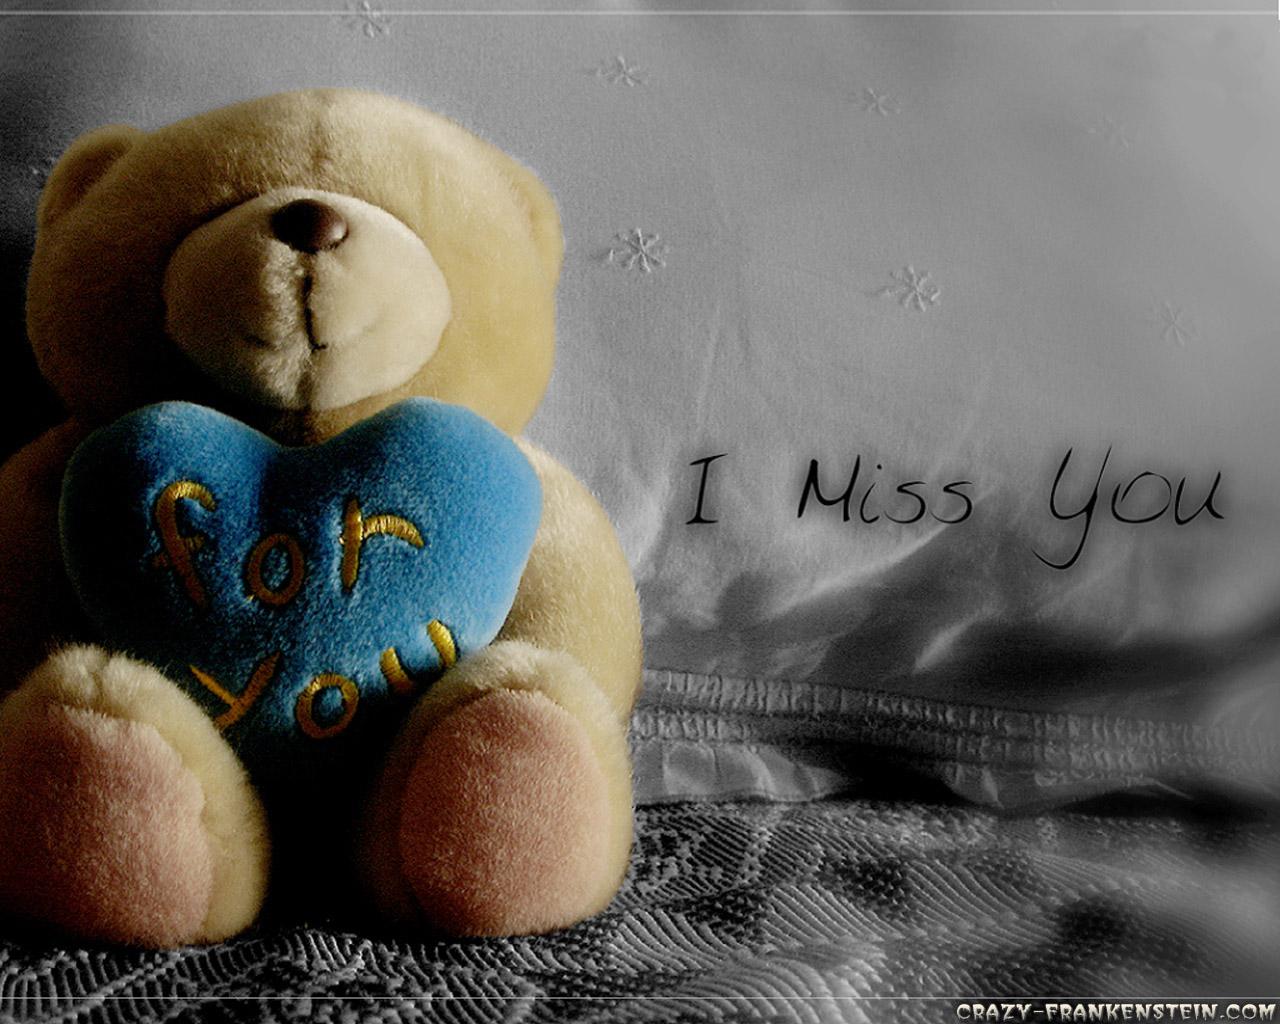 http://2.bp.blogspot.com/-Kgtvp5DFLfc/TakLv0uWoAI/AAAAAAAAARY/RDDOvxZ_dRc/s1600/my-love-i-miss-u-teddy-bear-wallpapers-1280x1024.jpg